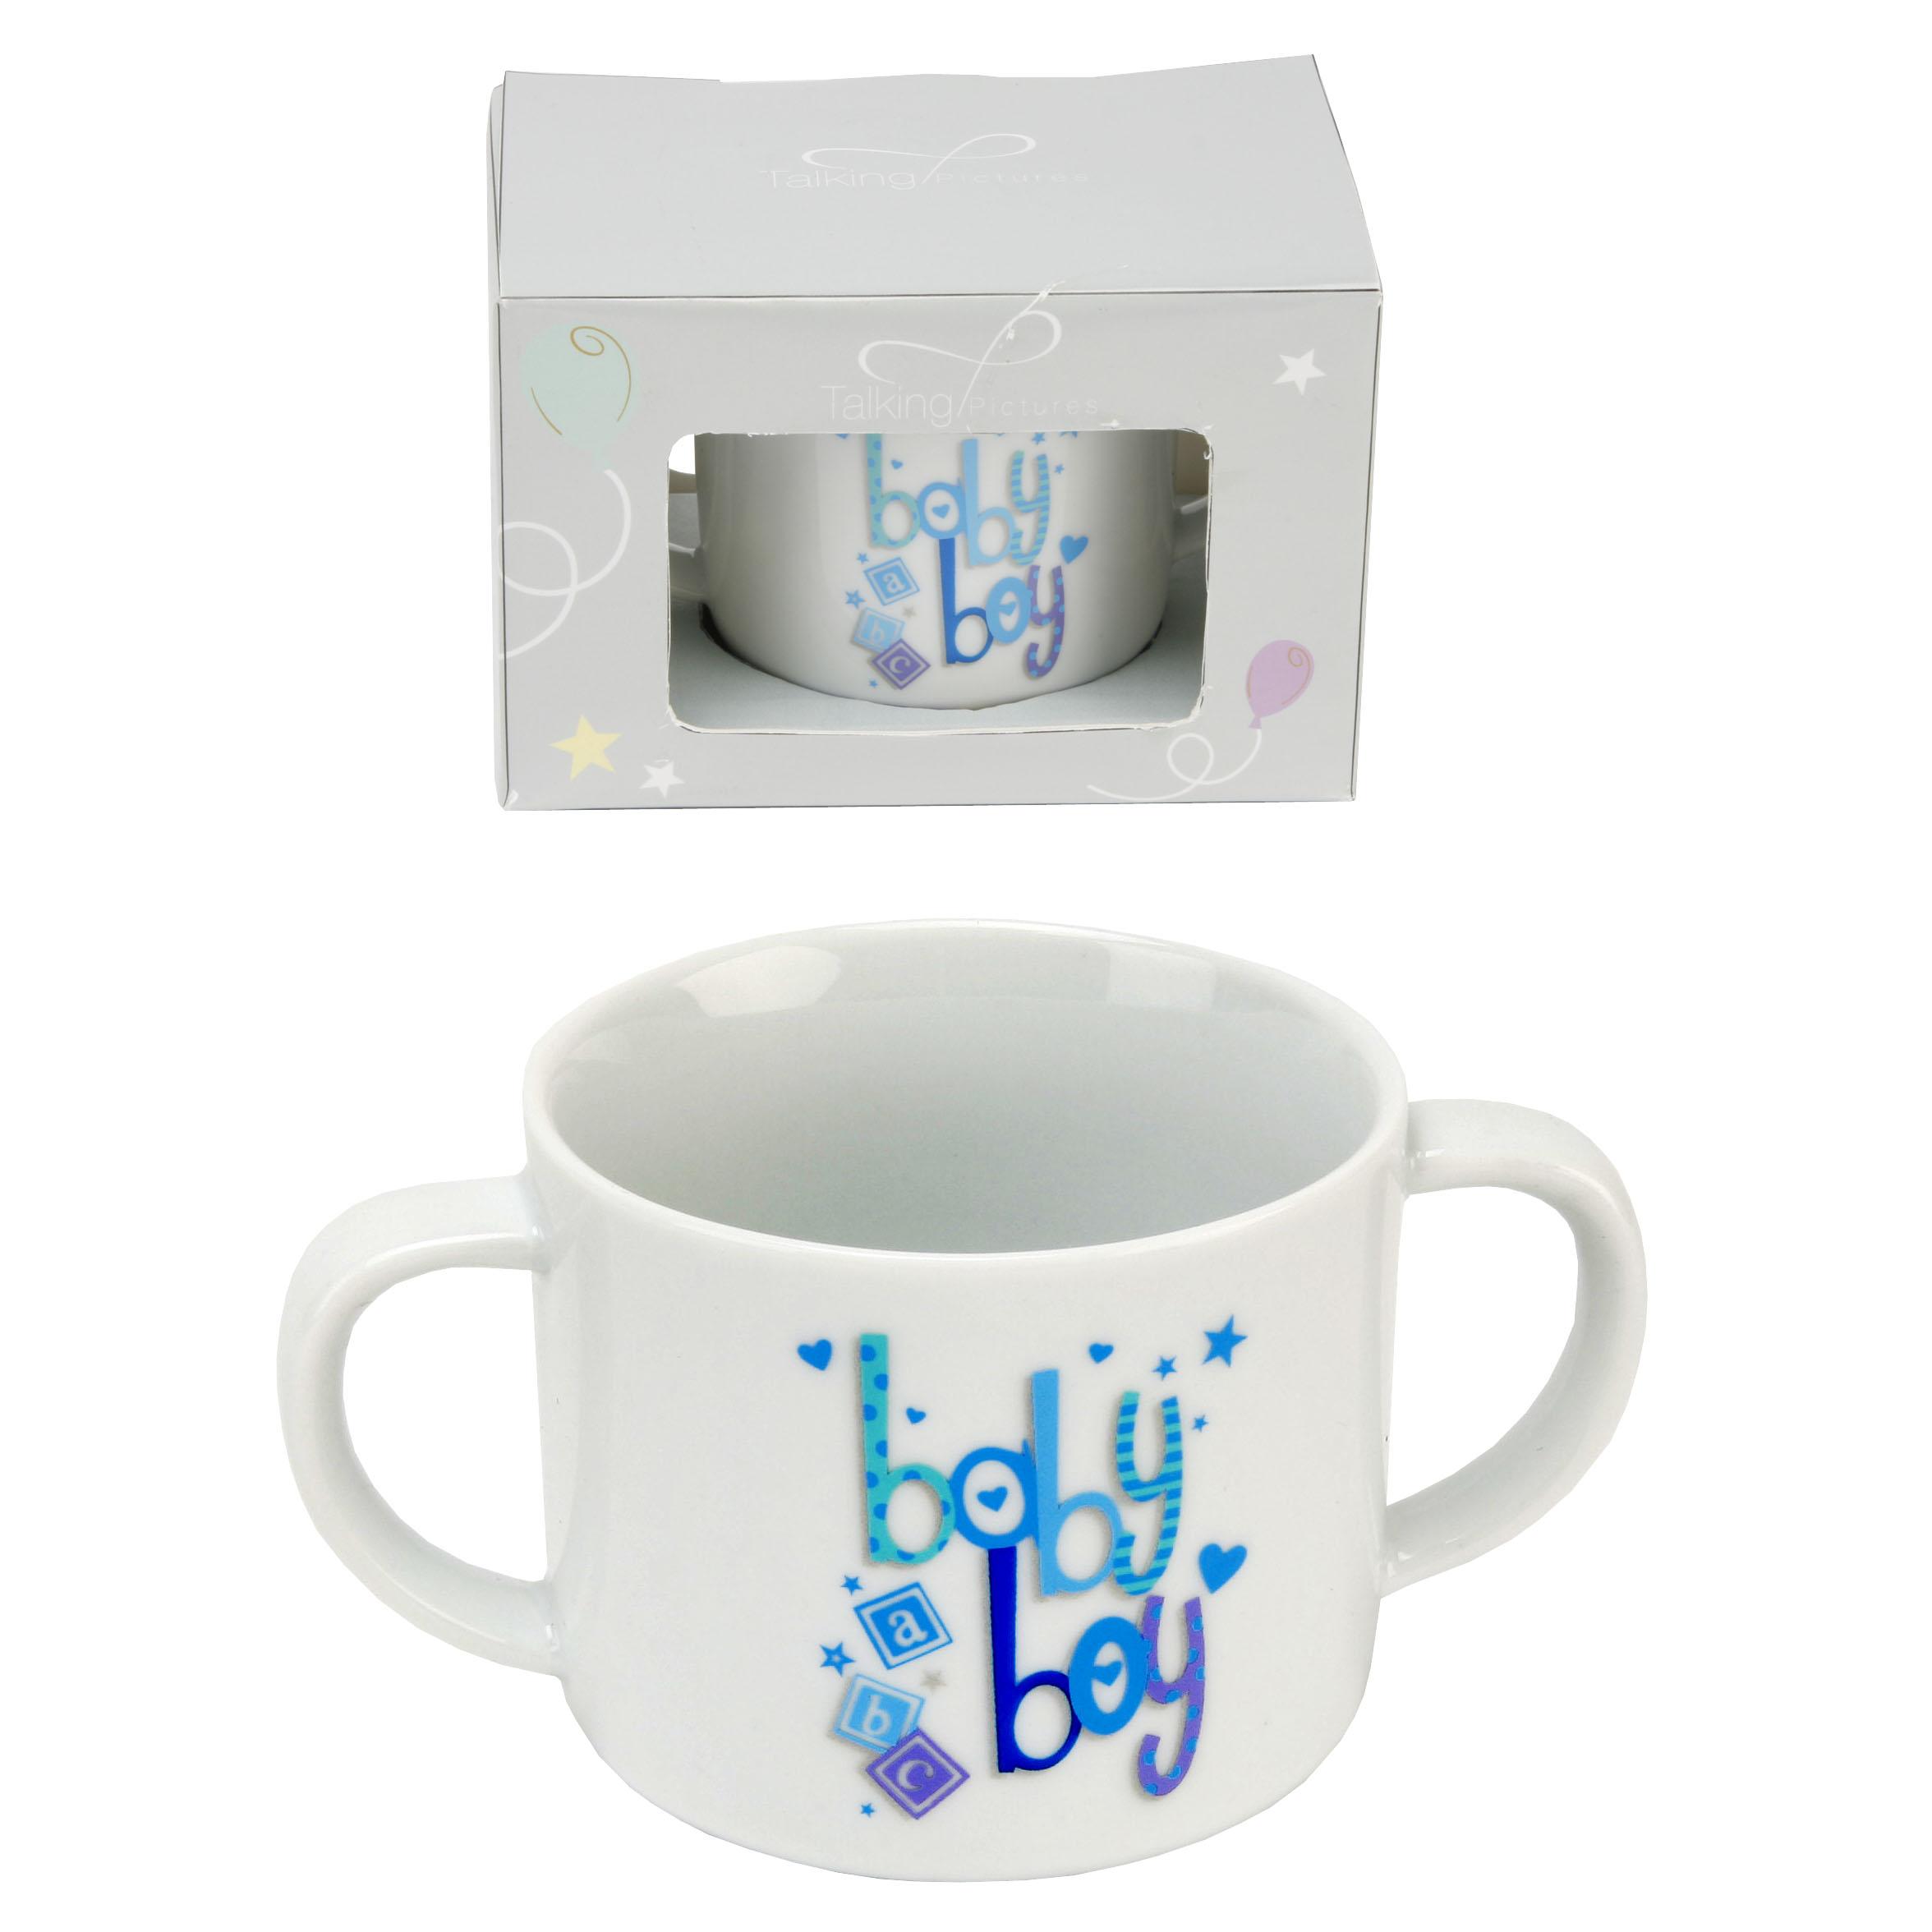 Twin Handled New Baby Boy Mug In Box Gifts Love Kates